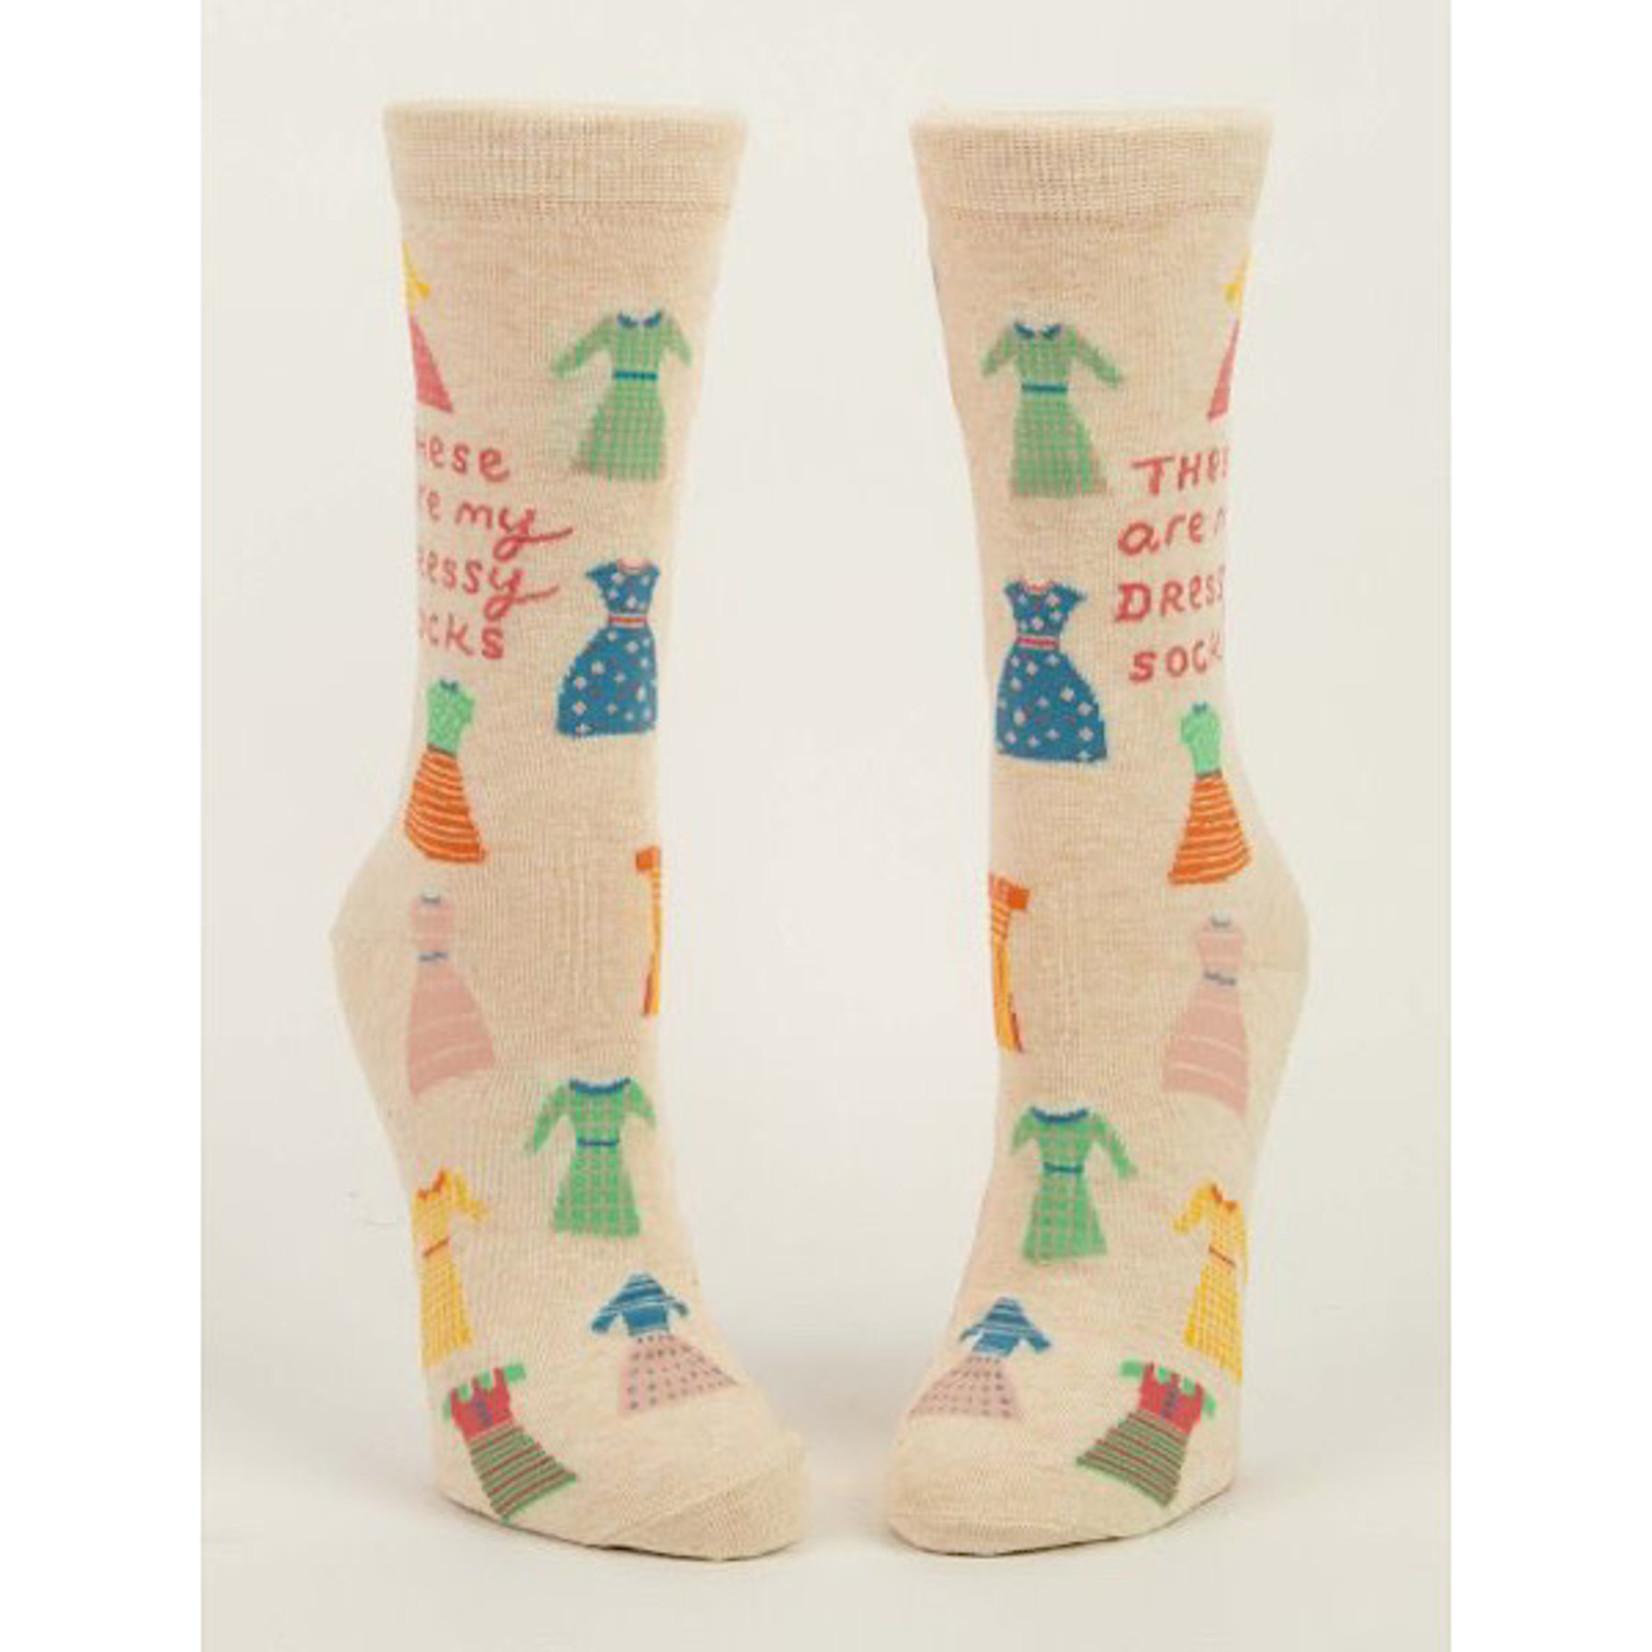 Socks (Womens) - These Are My Dressy Socks